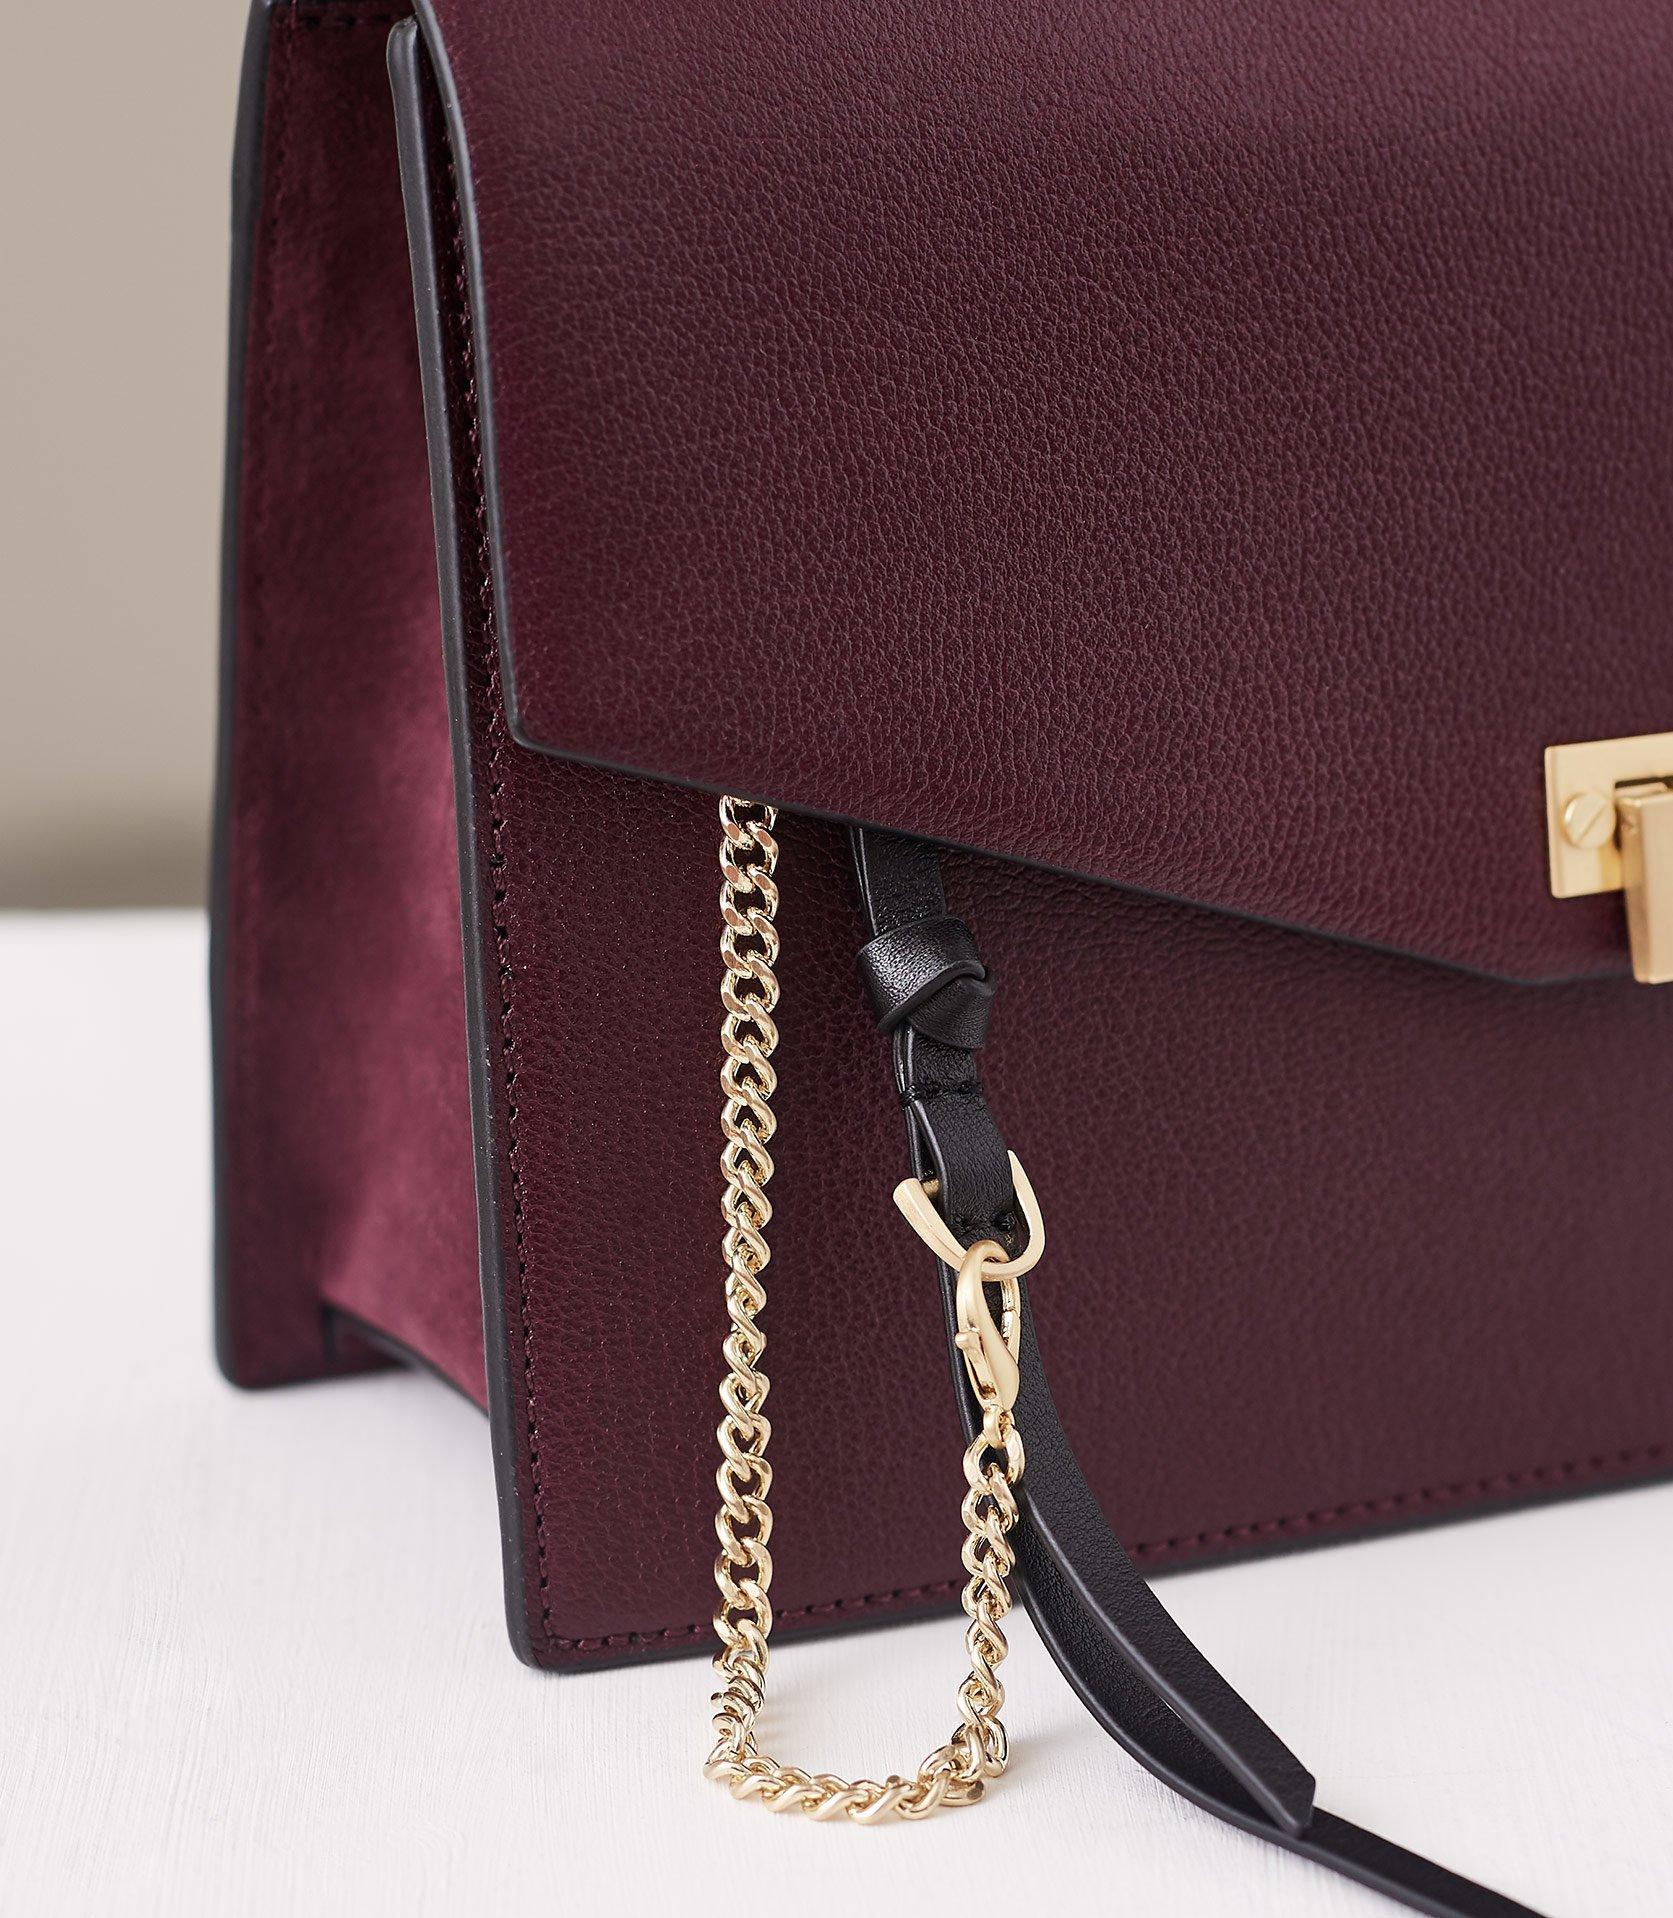 d9c02284aa Reiss - Purple Conway - Leather Lock Closure Shoulder Bag - Lyst. View  fullscreen